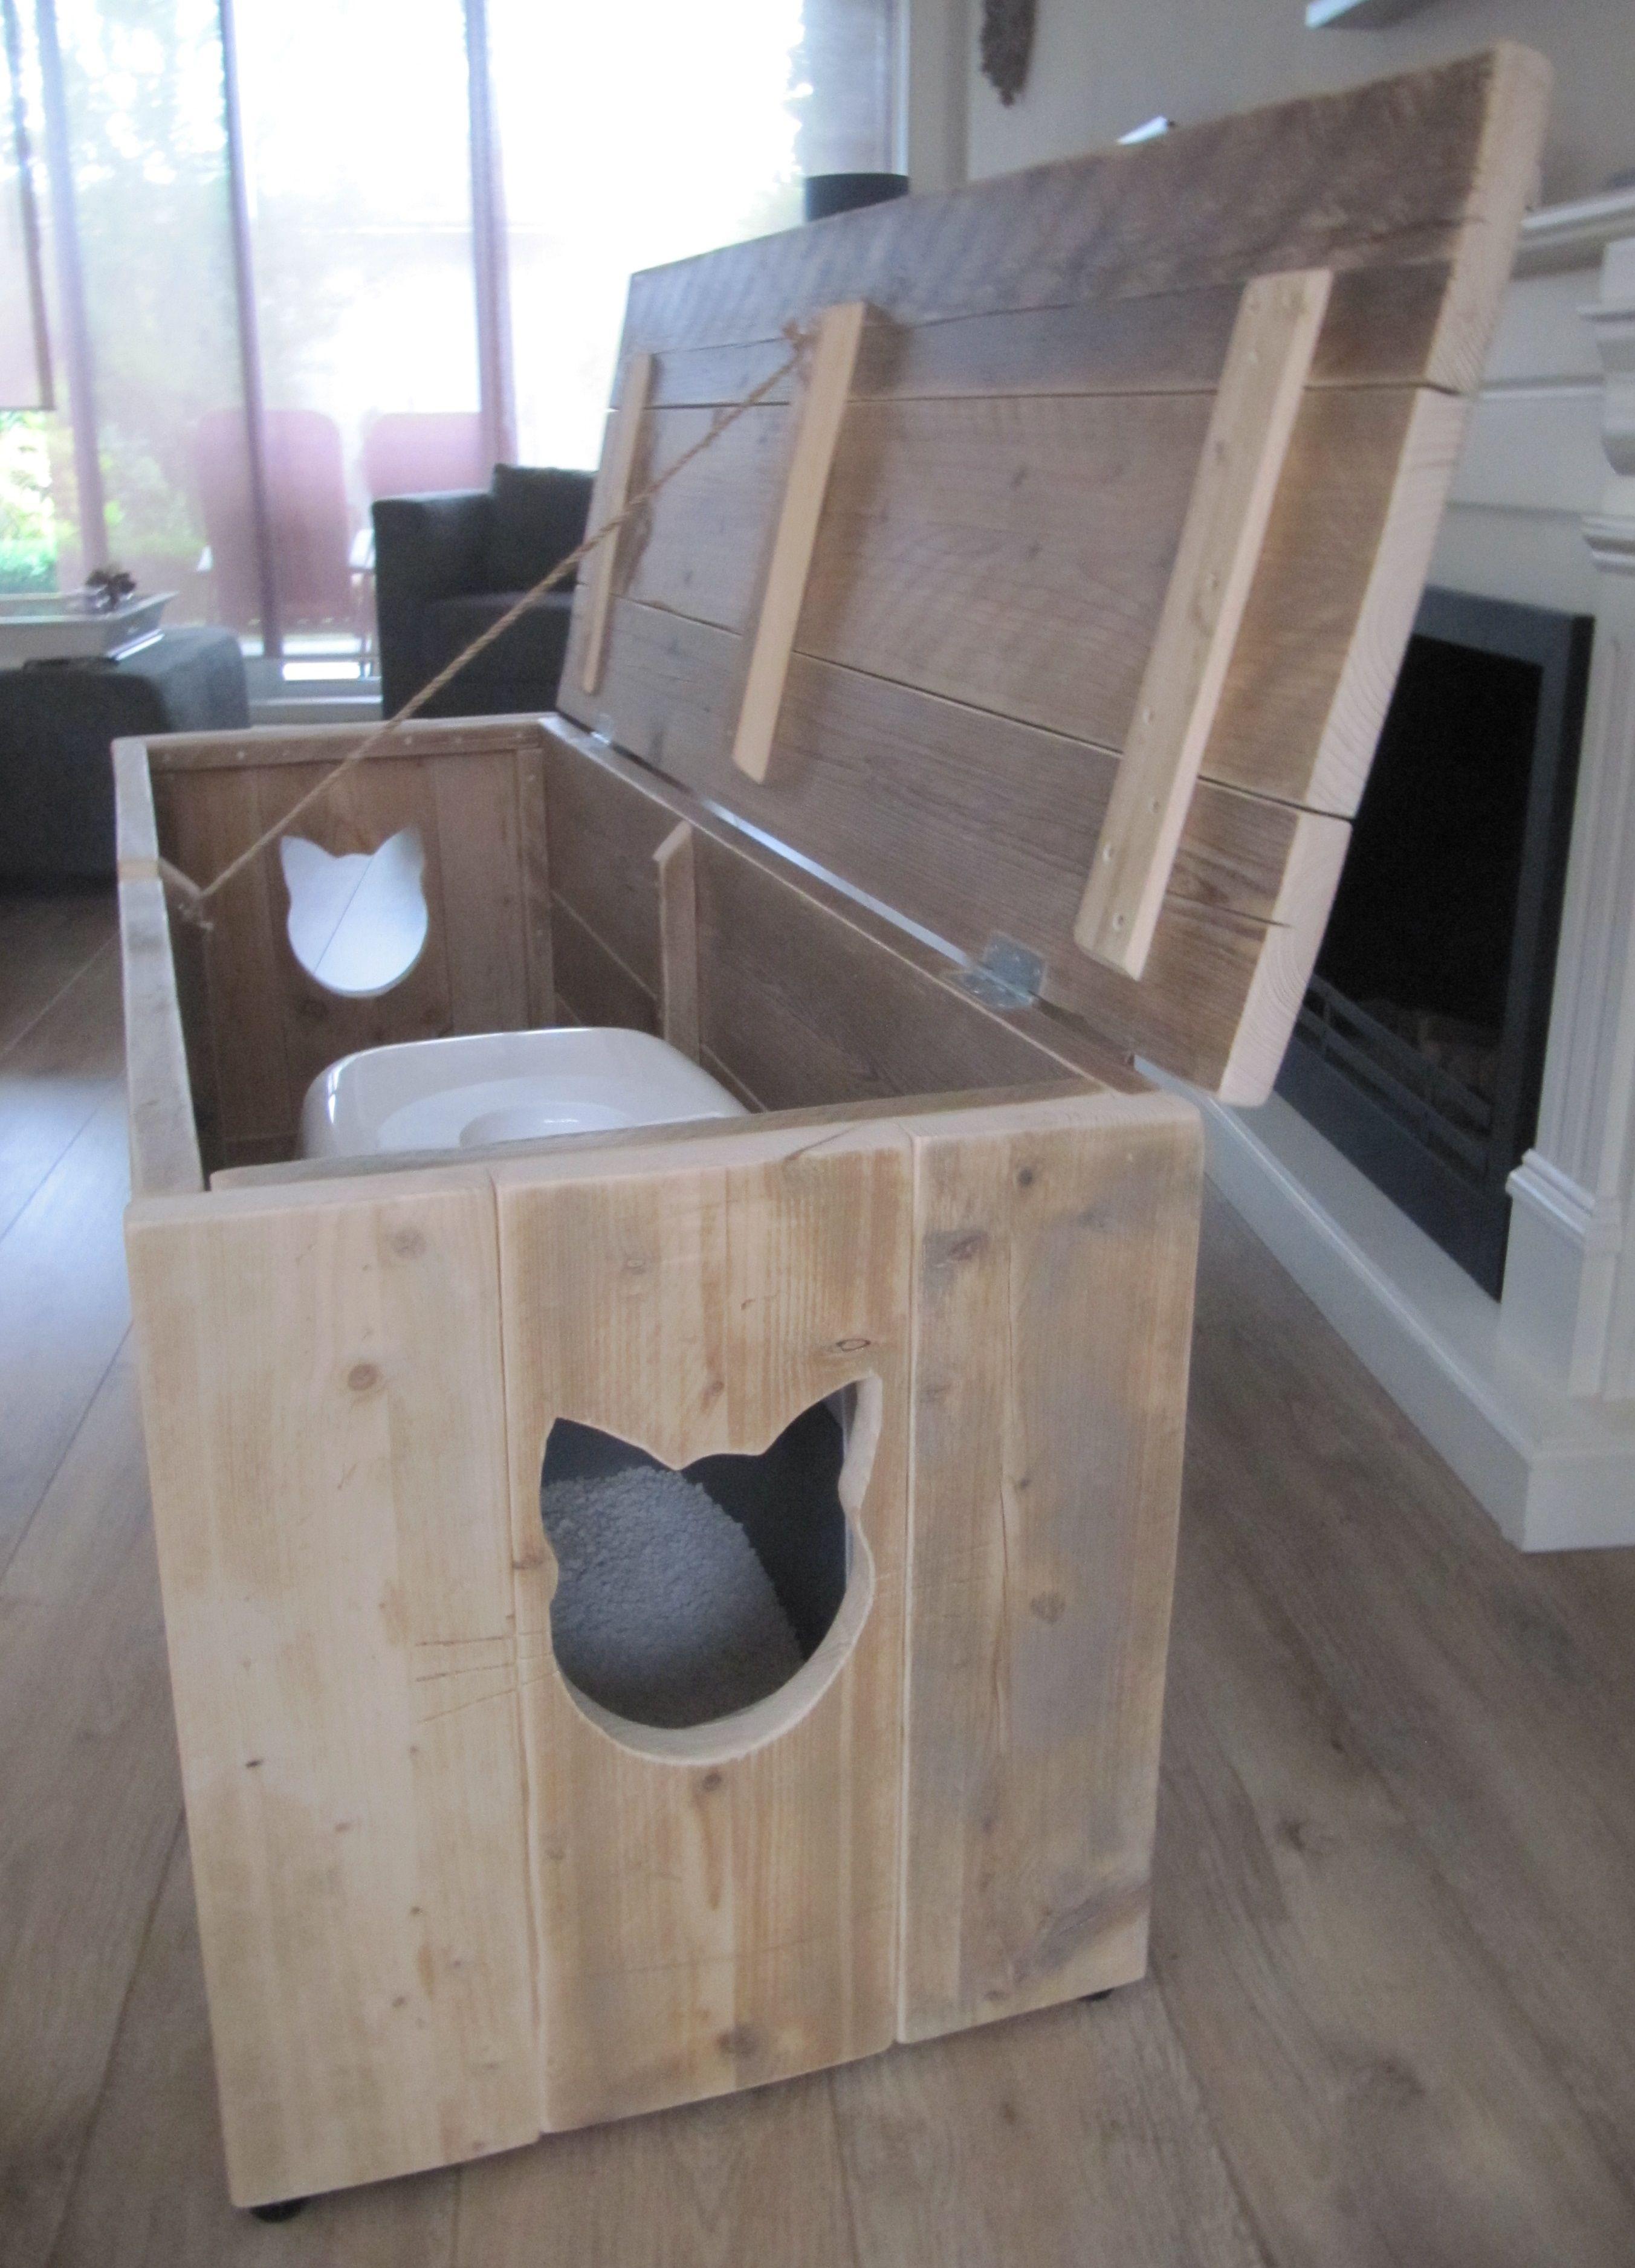 Kattenbak Kast Marianne Van Gebruikt Steigerhout For The